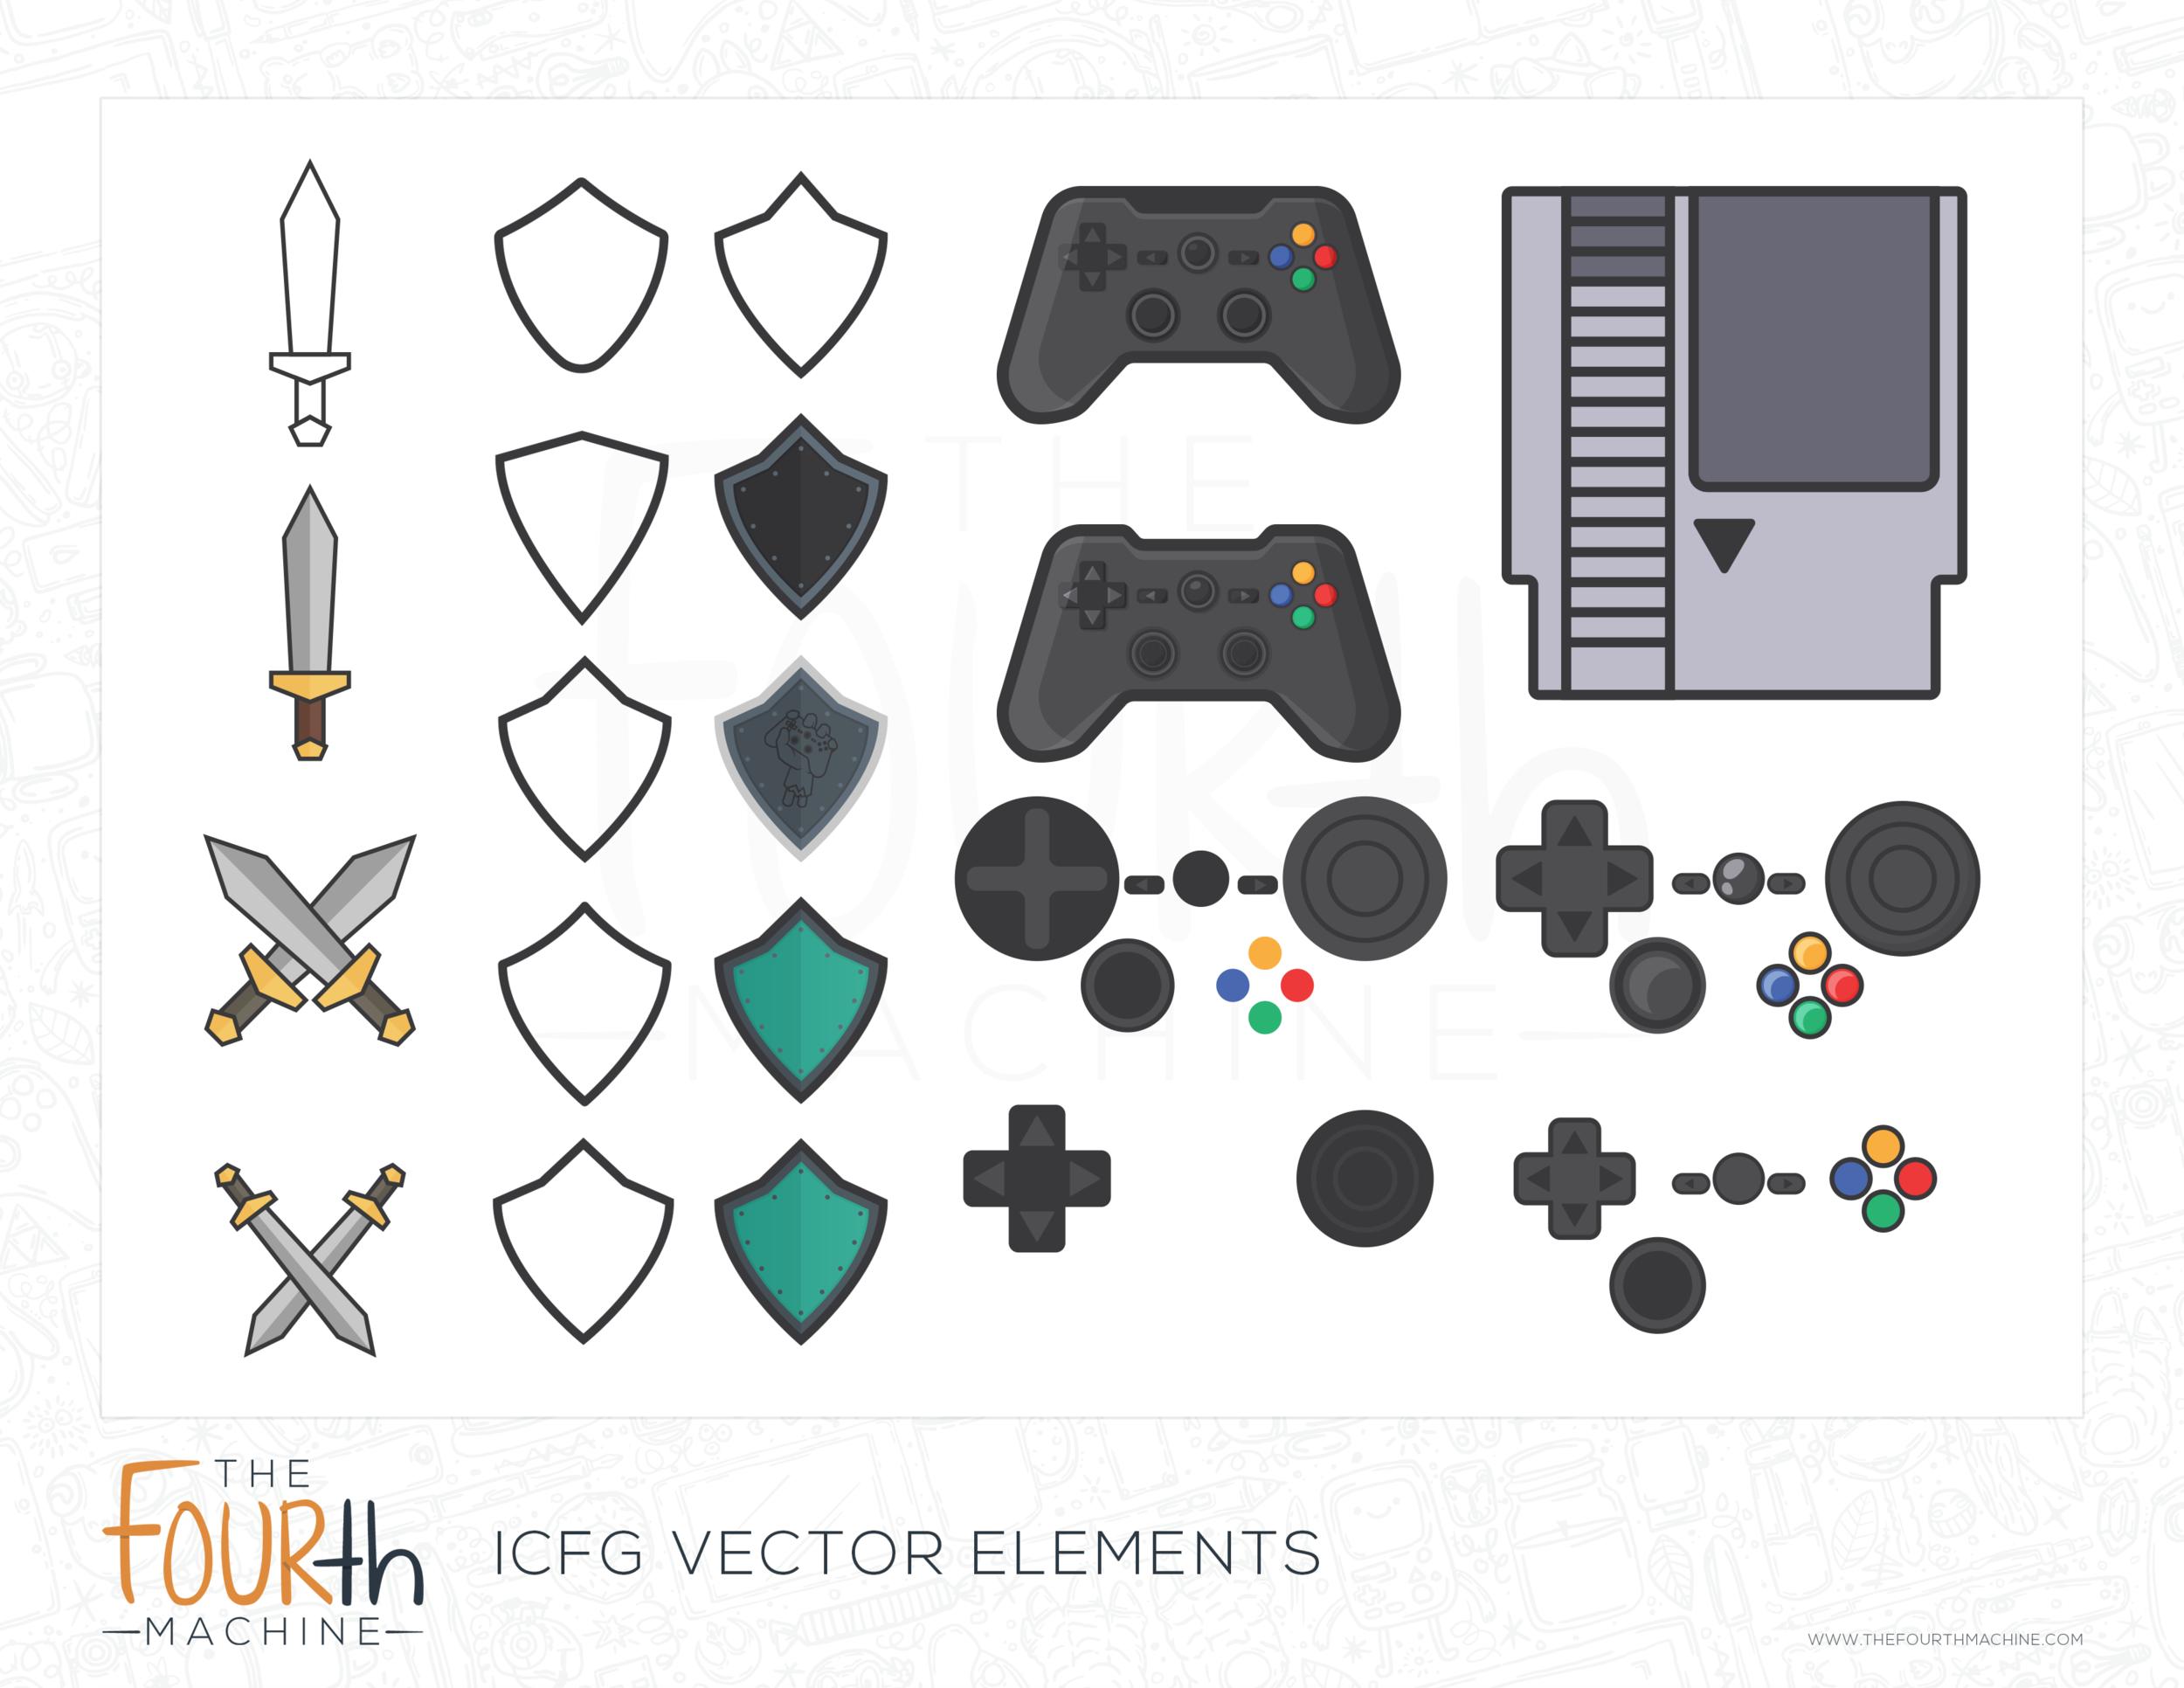 ICFG_Vector_Elements.png